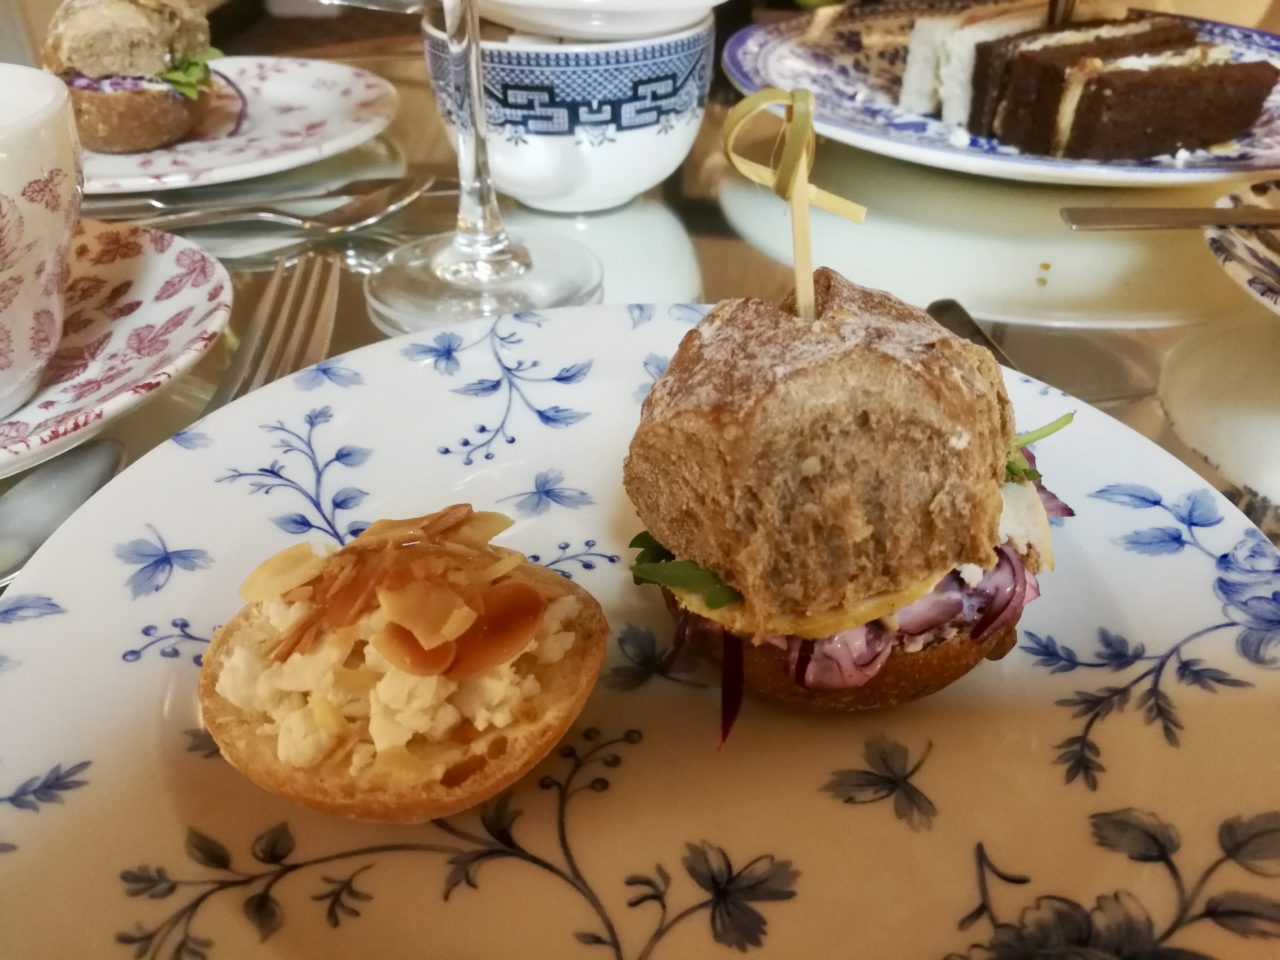 Goat's Cheese Roll and Honey & Mustard Chicken Sandwich